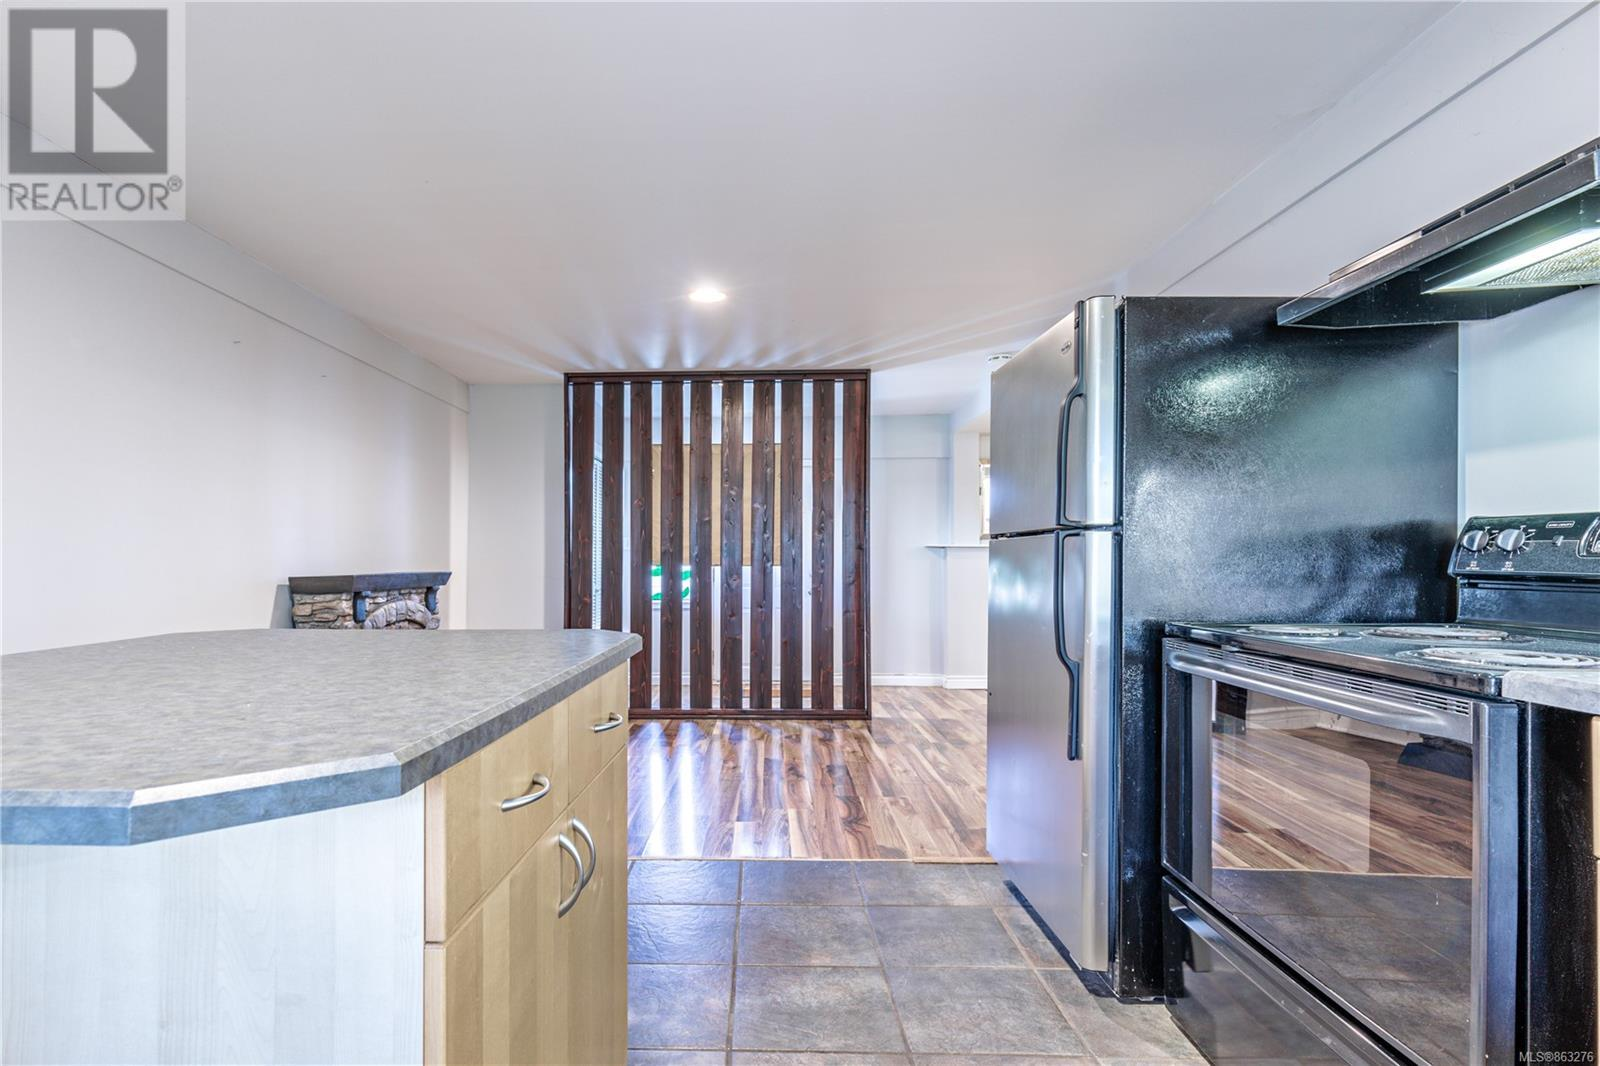 673 Winchester Ave, Nanaimo, British Columbia  V9R 4B6 - Photo 4 - 863276